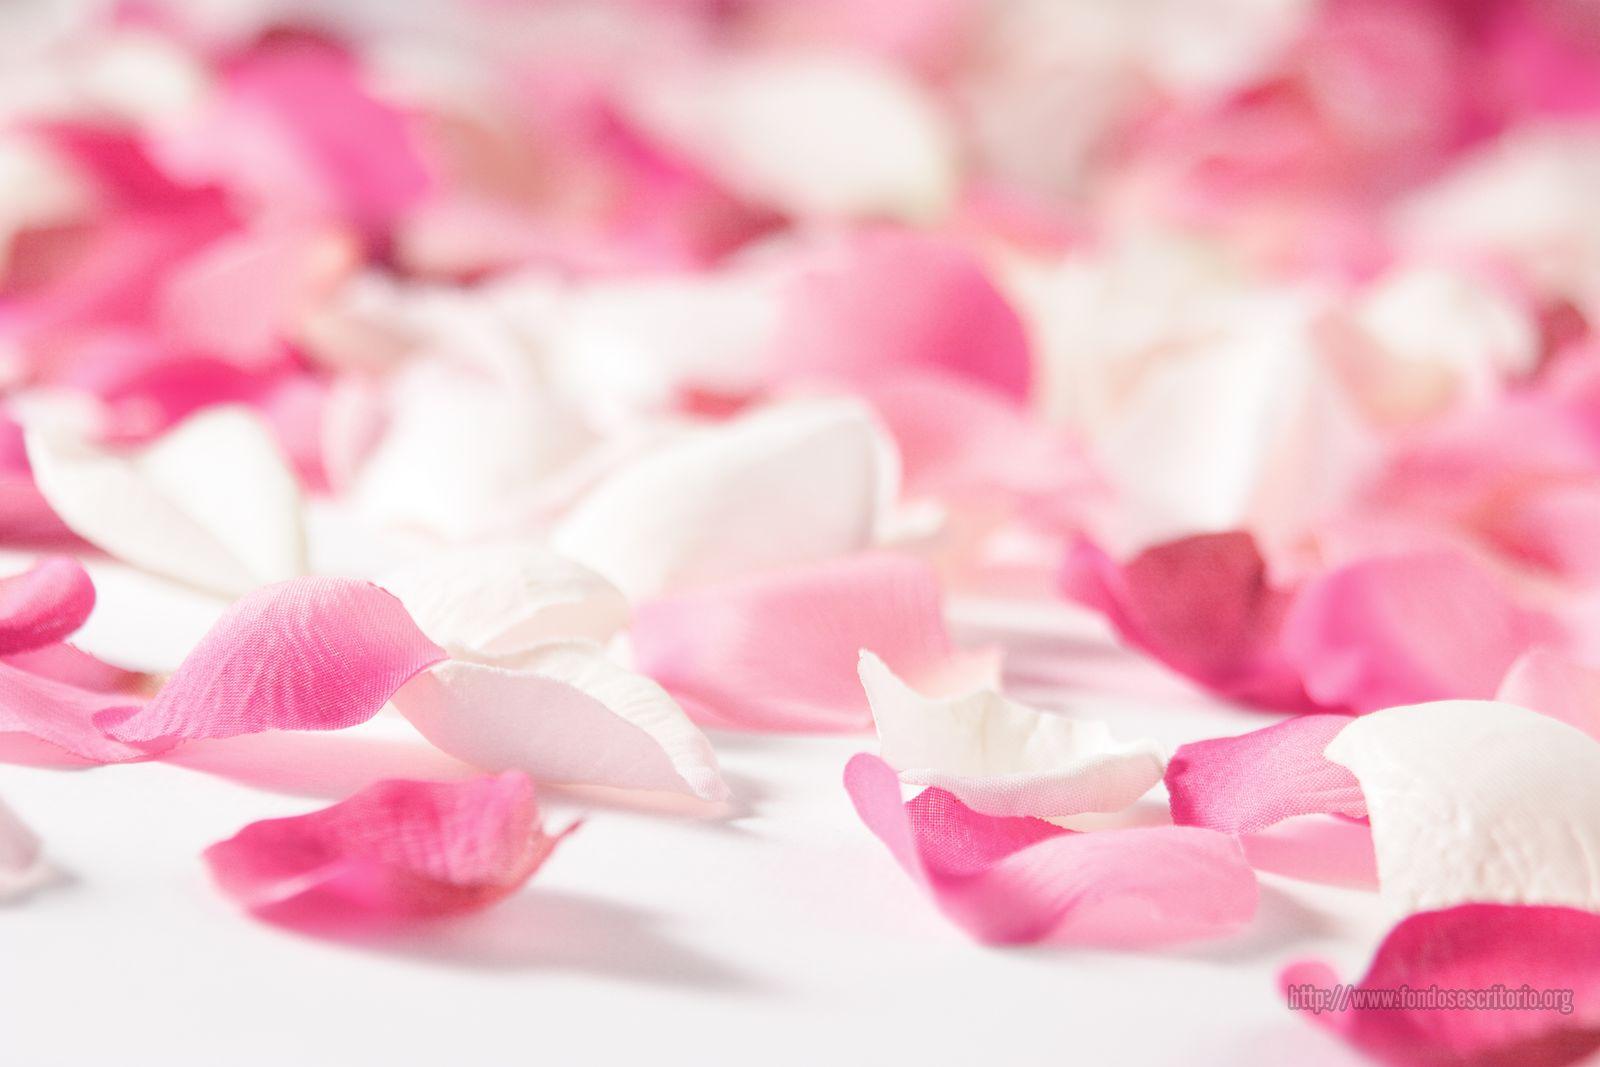 Wall Paper Wide Pink Rose Colours Soft Nature Flower: Plantas De Interior Y Exterior